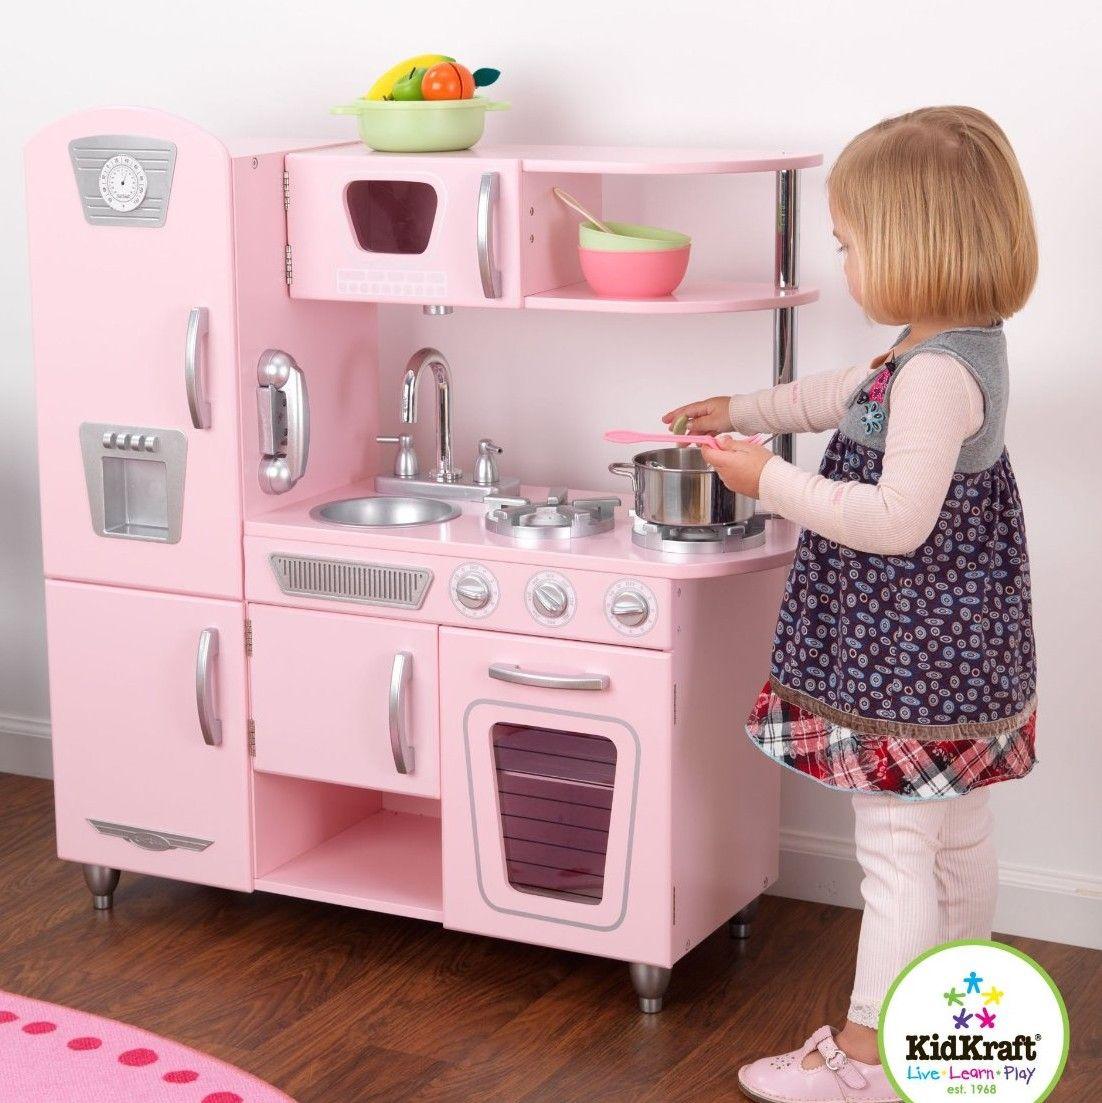 Vintage Kitchen Set  Wooden play kitchen, Kidkraft vintage